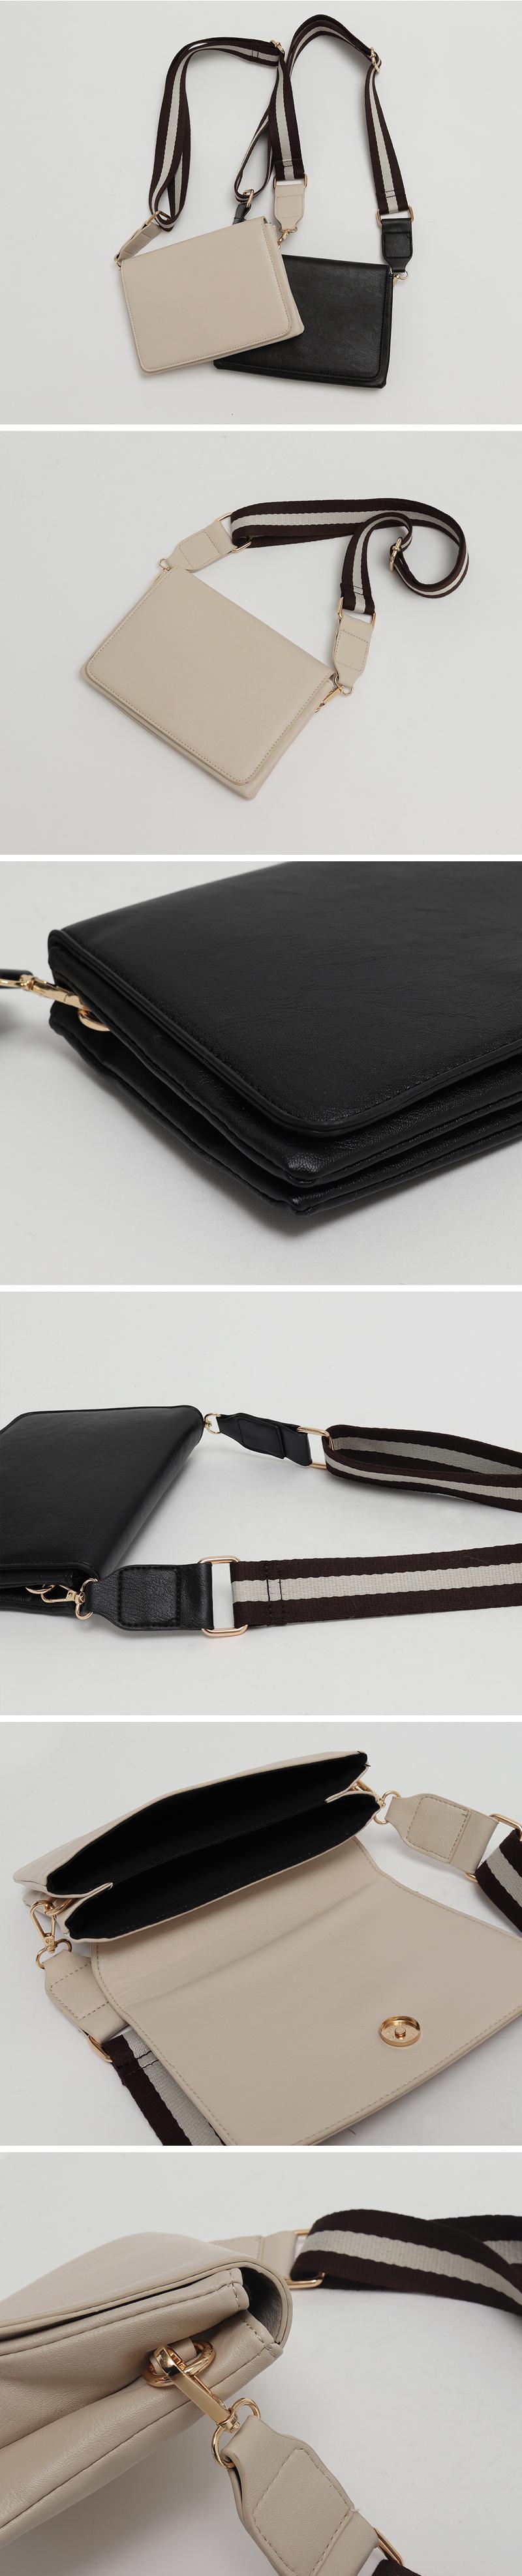 Log strap cross bag_U